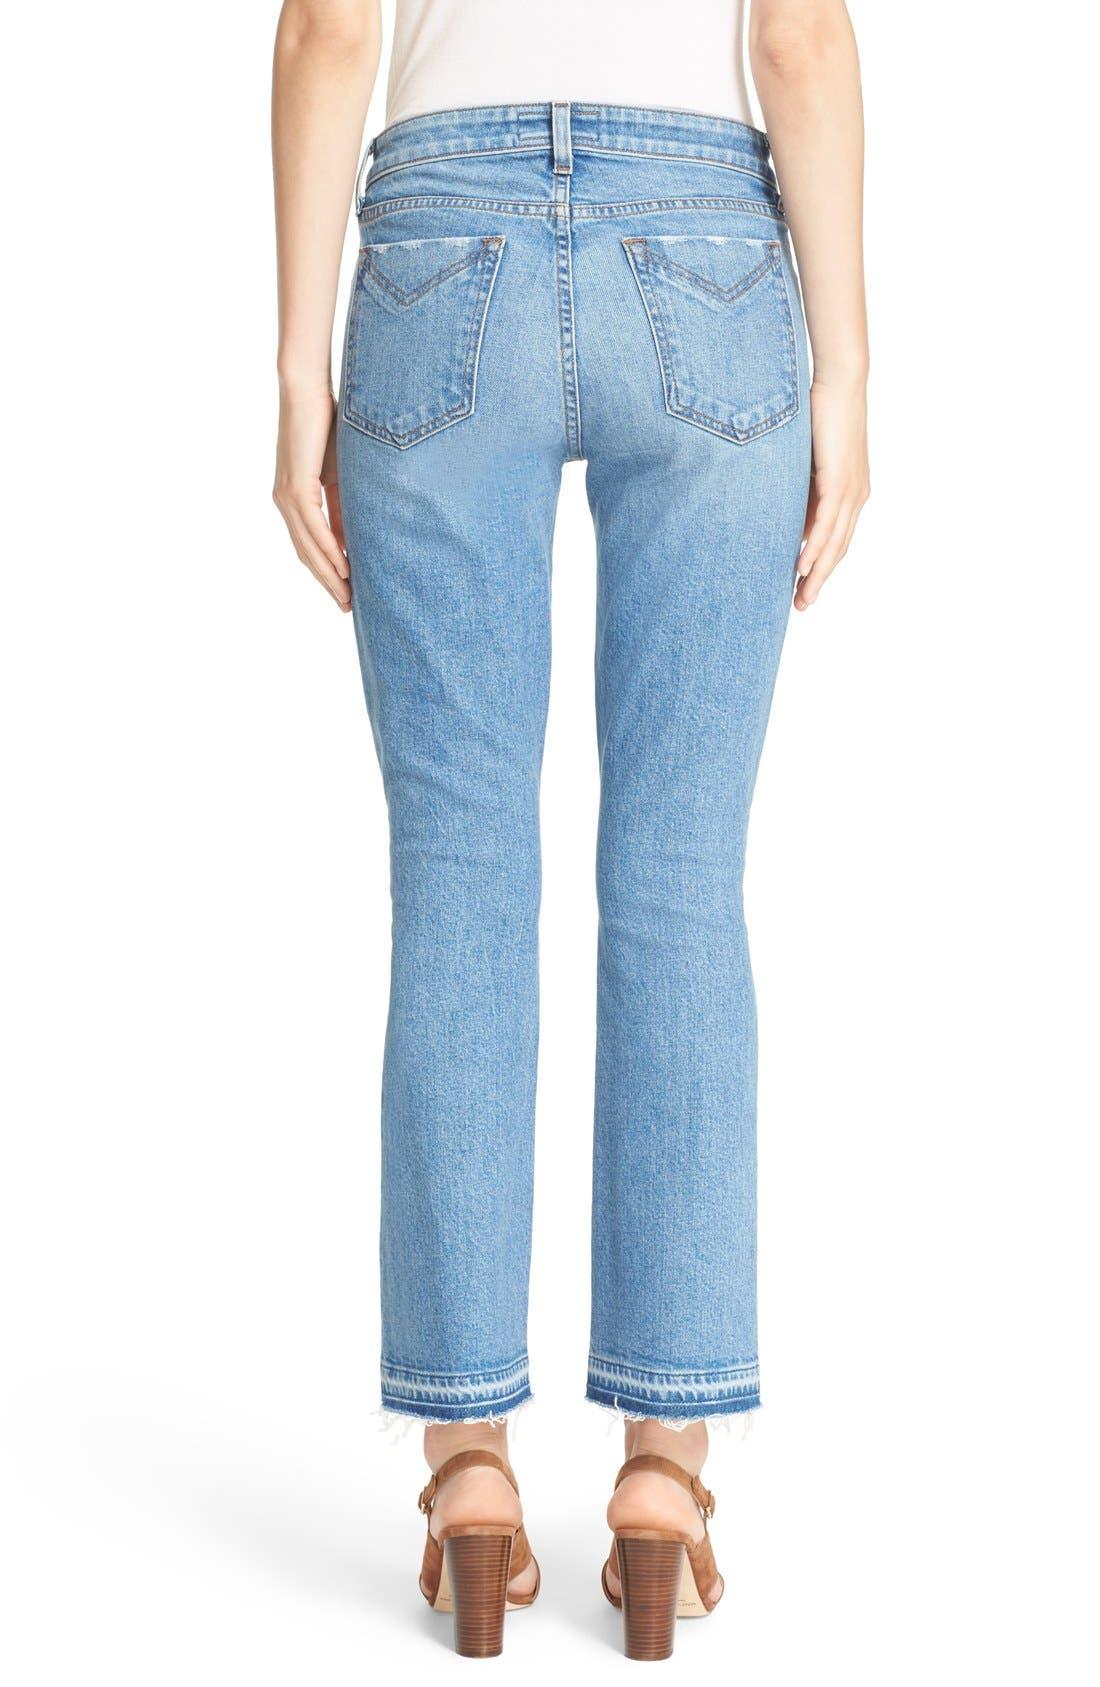 Alternate Image 2  - Derek Lam 10 Crosby 'Gia' Crop Flare Jeans (Light Wash)